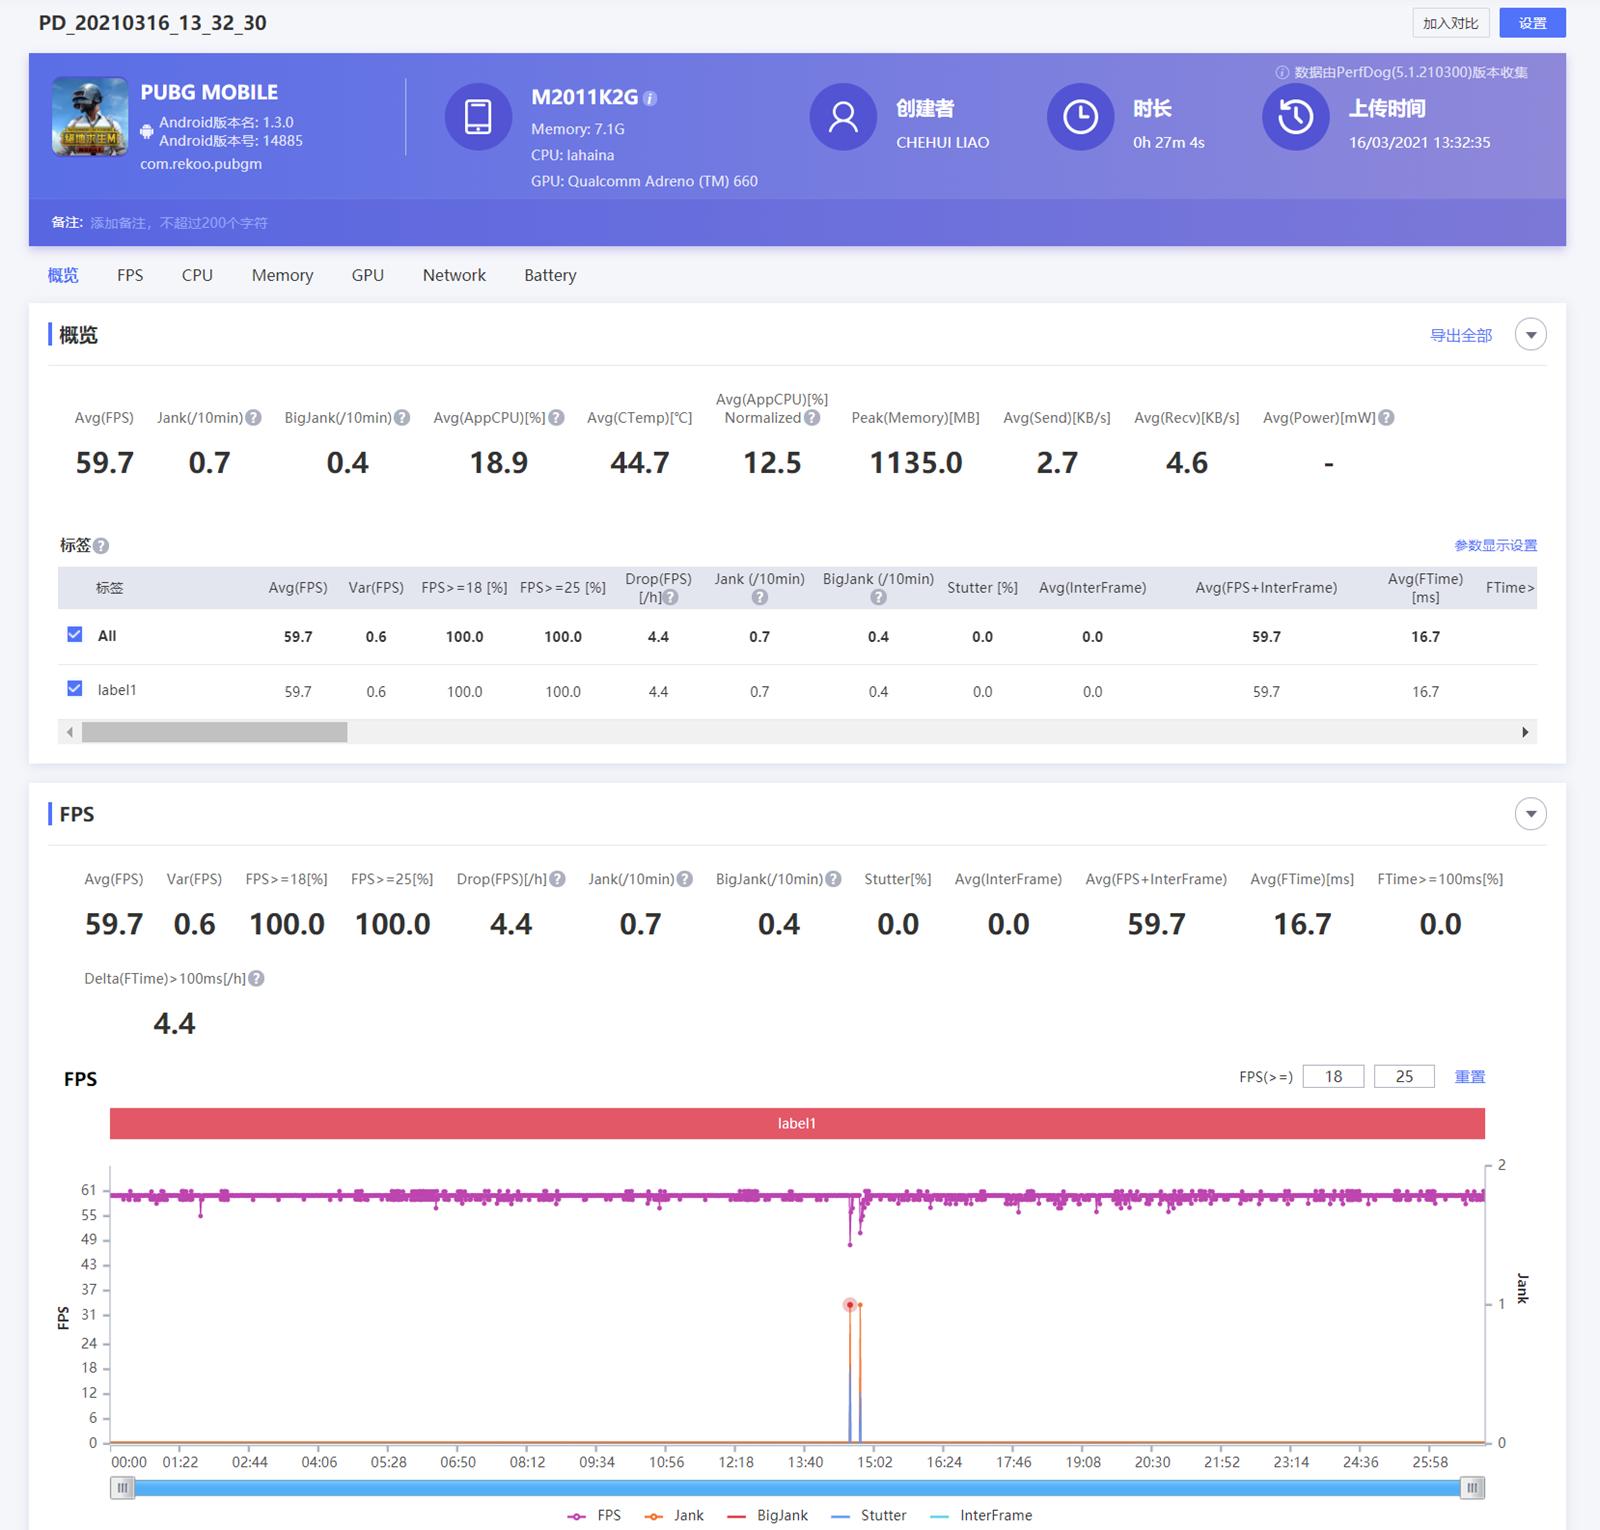 2021-03-17-18_39_16-PerfDog-_-移动全平台性能测试分析专家.png @3C 達人廖阿輝